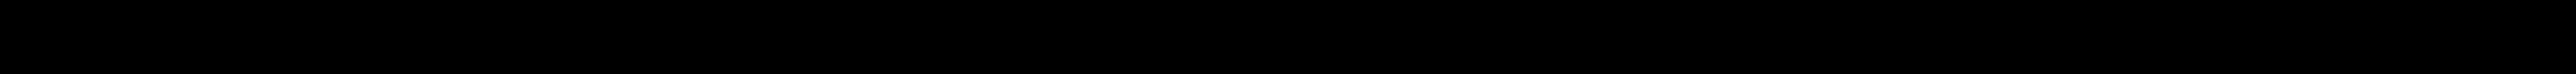 O X Y D — Fertigendes Konstruktionsbüro für Metallbau